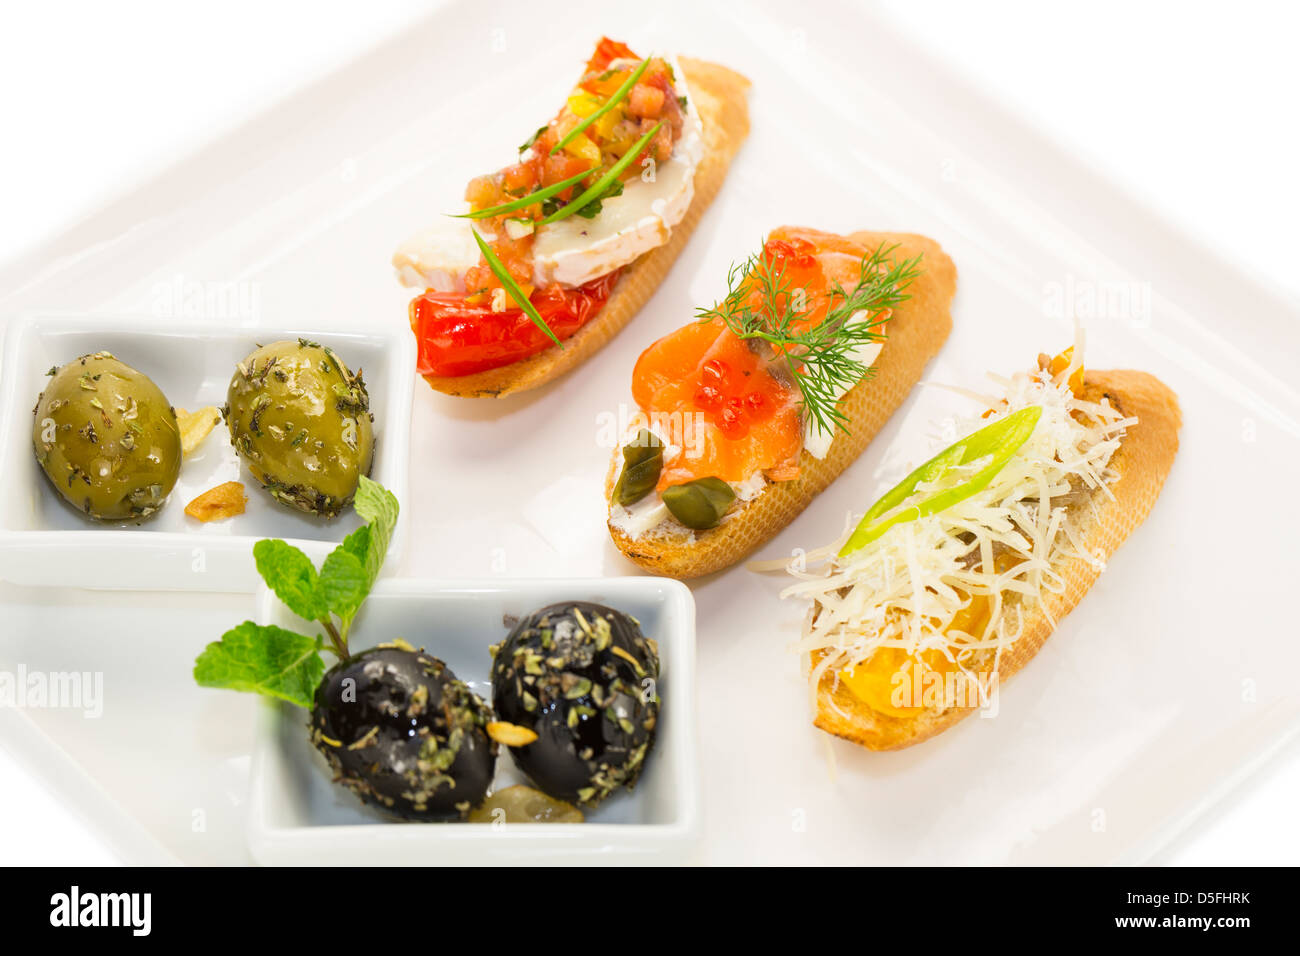 Spanish sandwiches - Stock Image